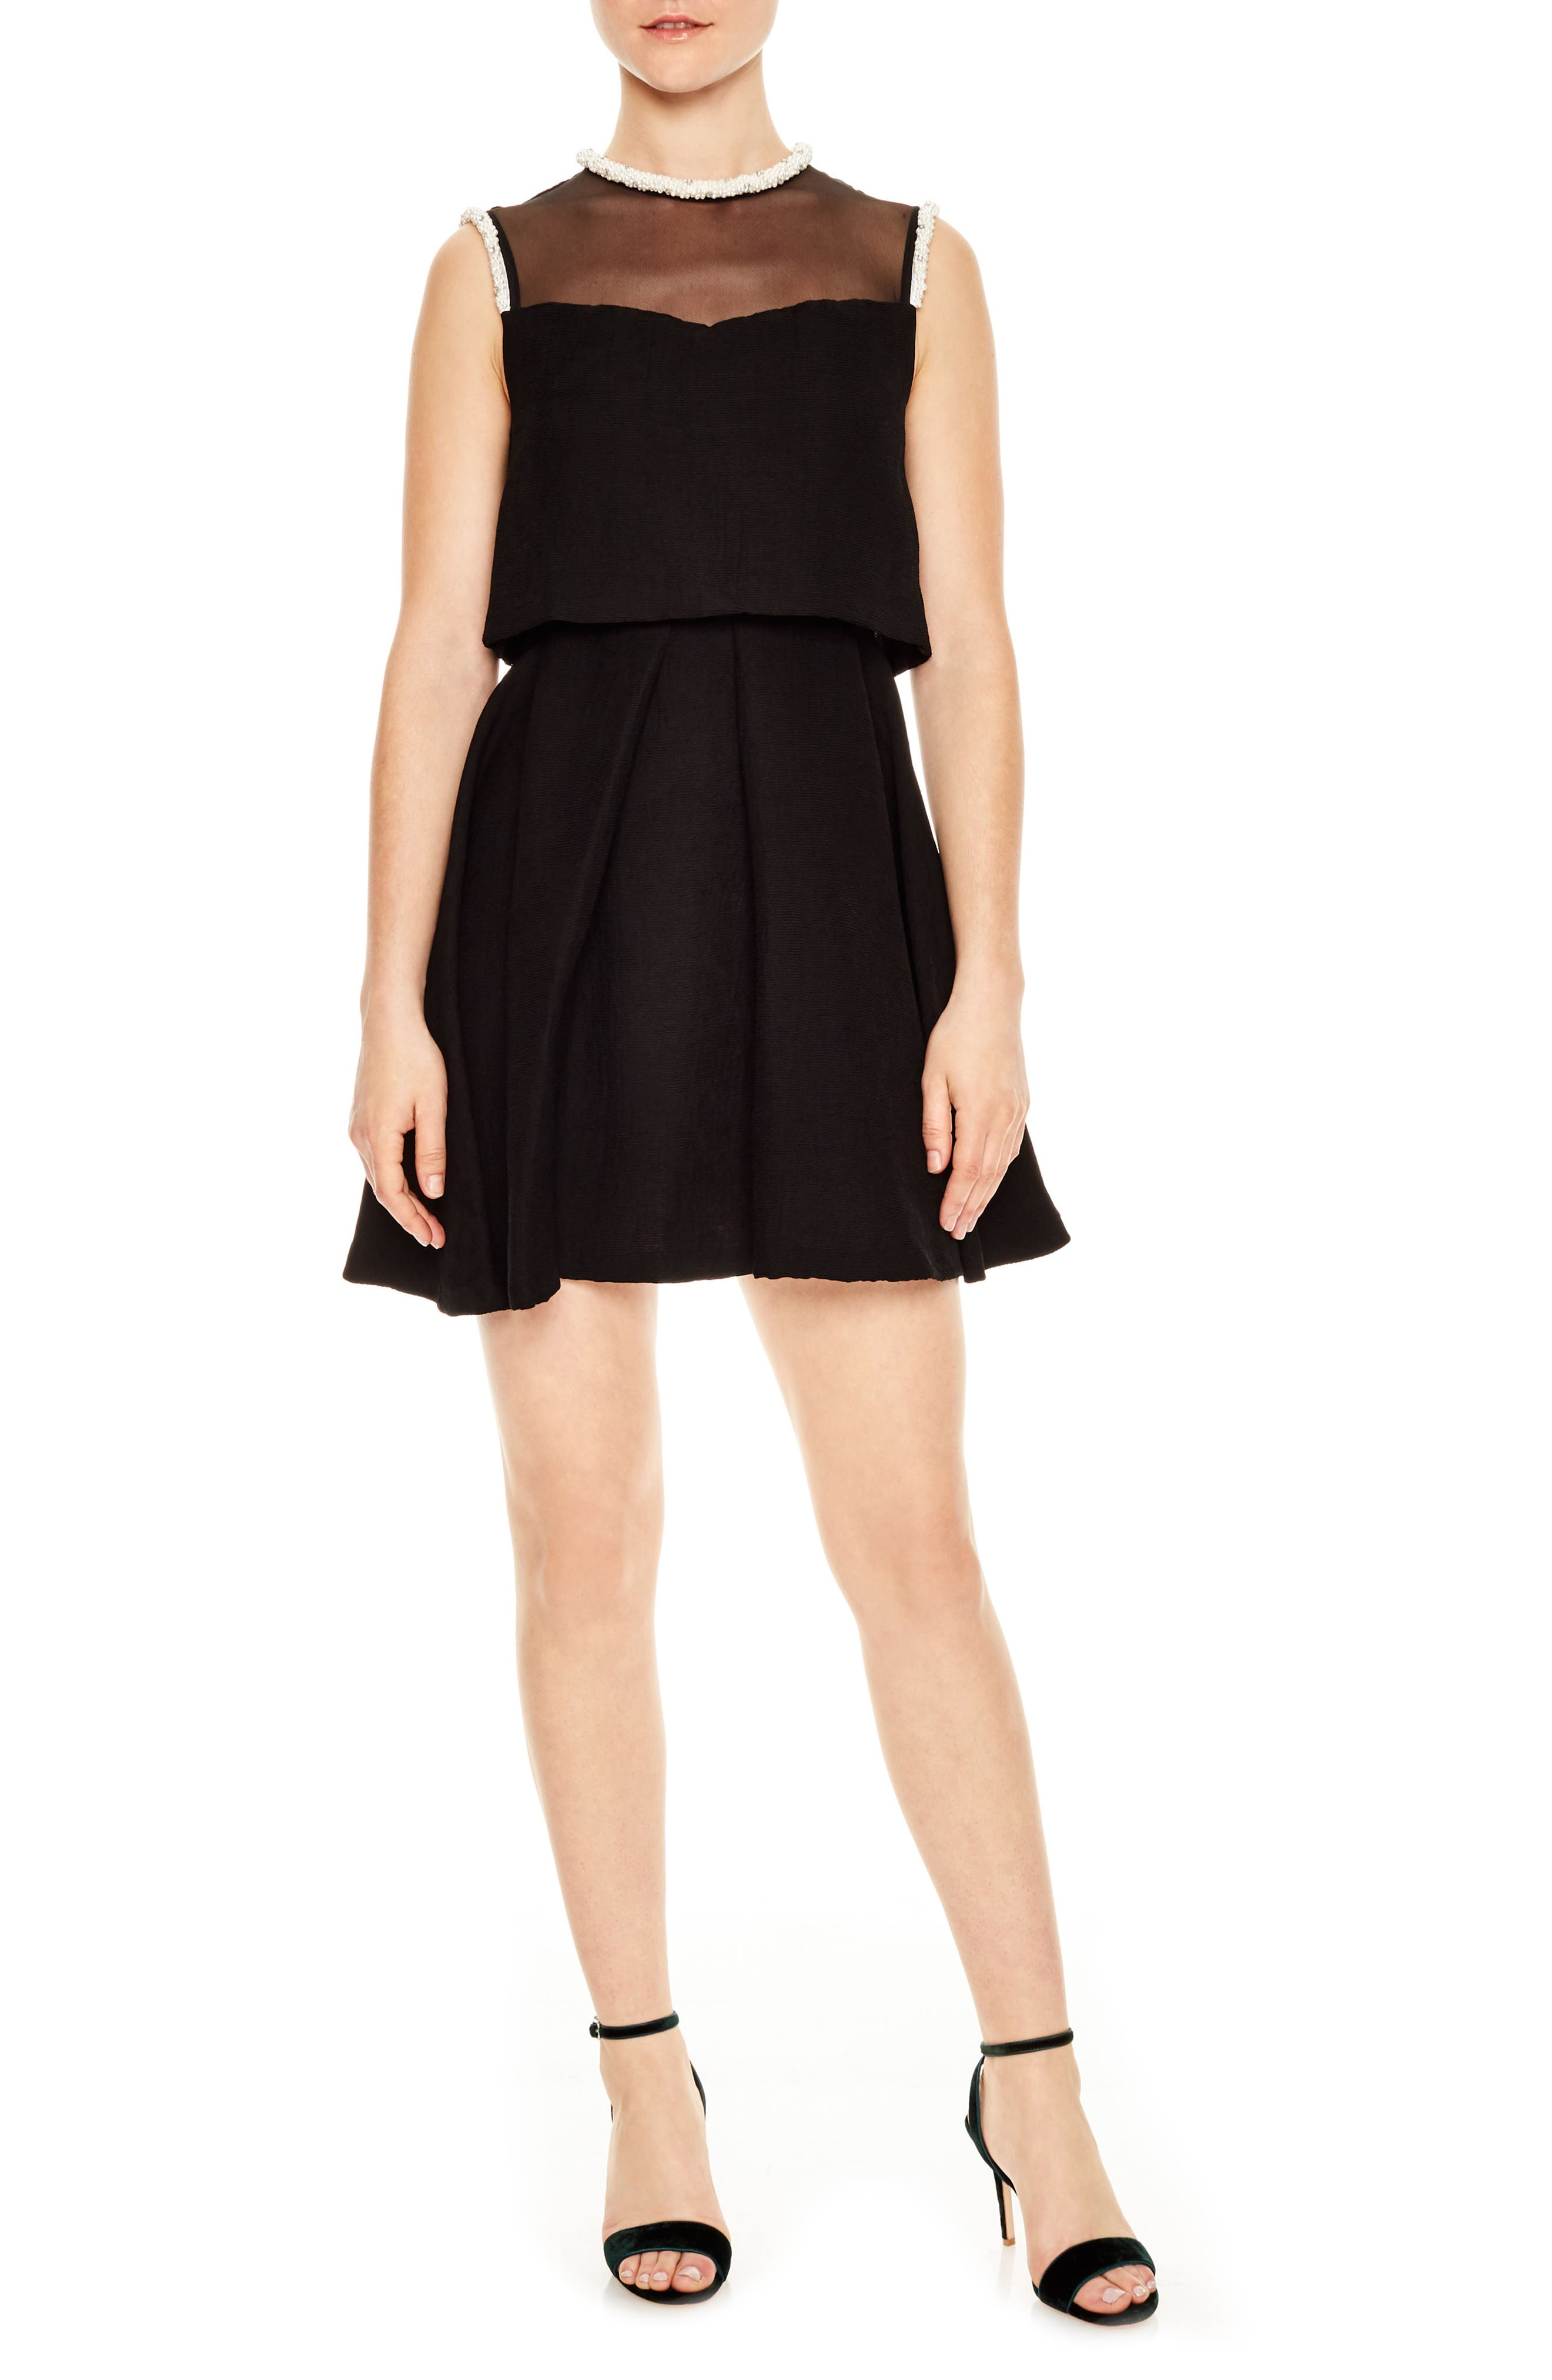 Ouma Jewel Neck Flare Dress,                         Main,                         color, Black